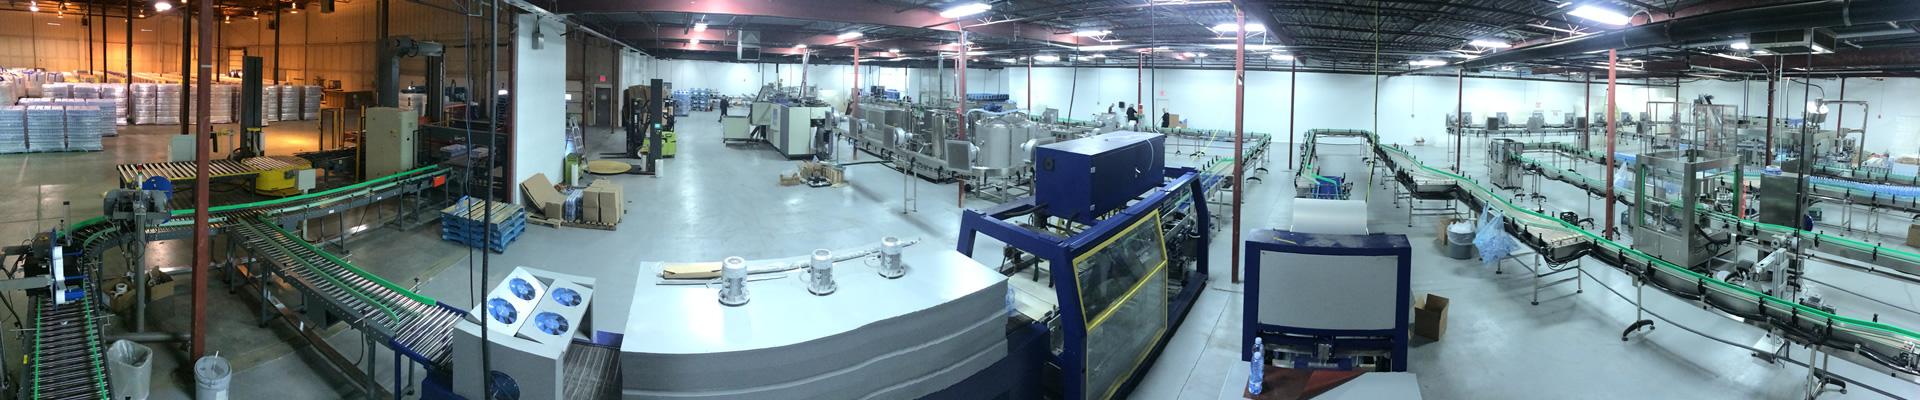 JNDWATER 5 Gallon Bottle Washing Filling Capping Bottling Machine-J&D WATER